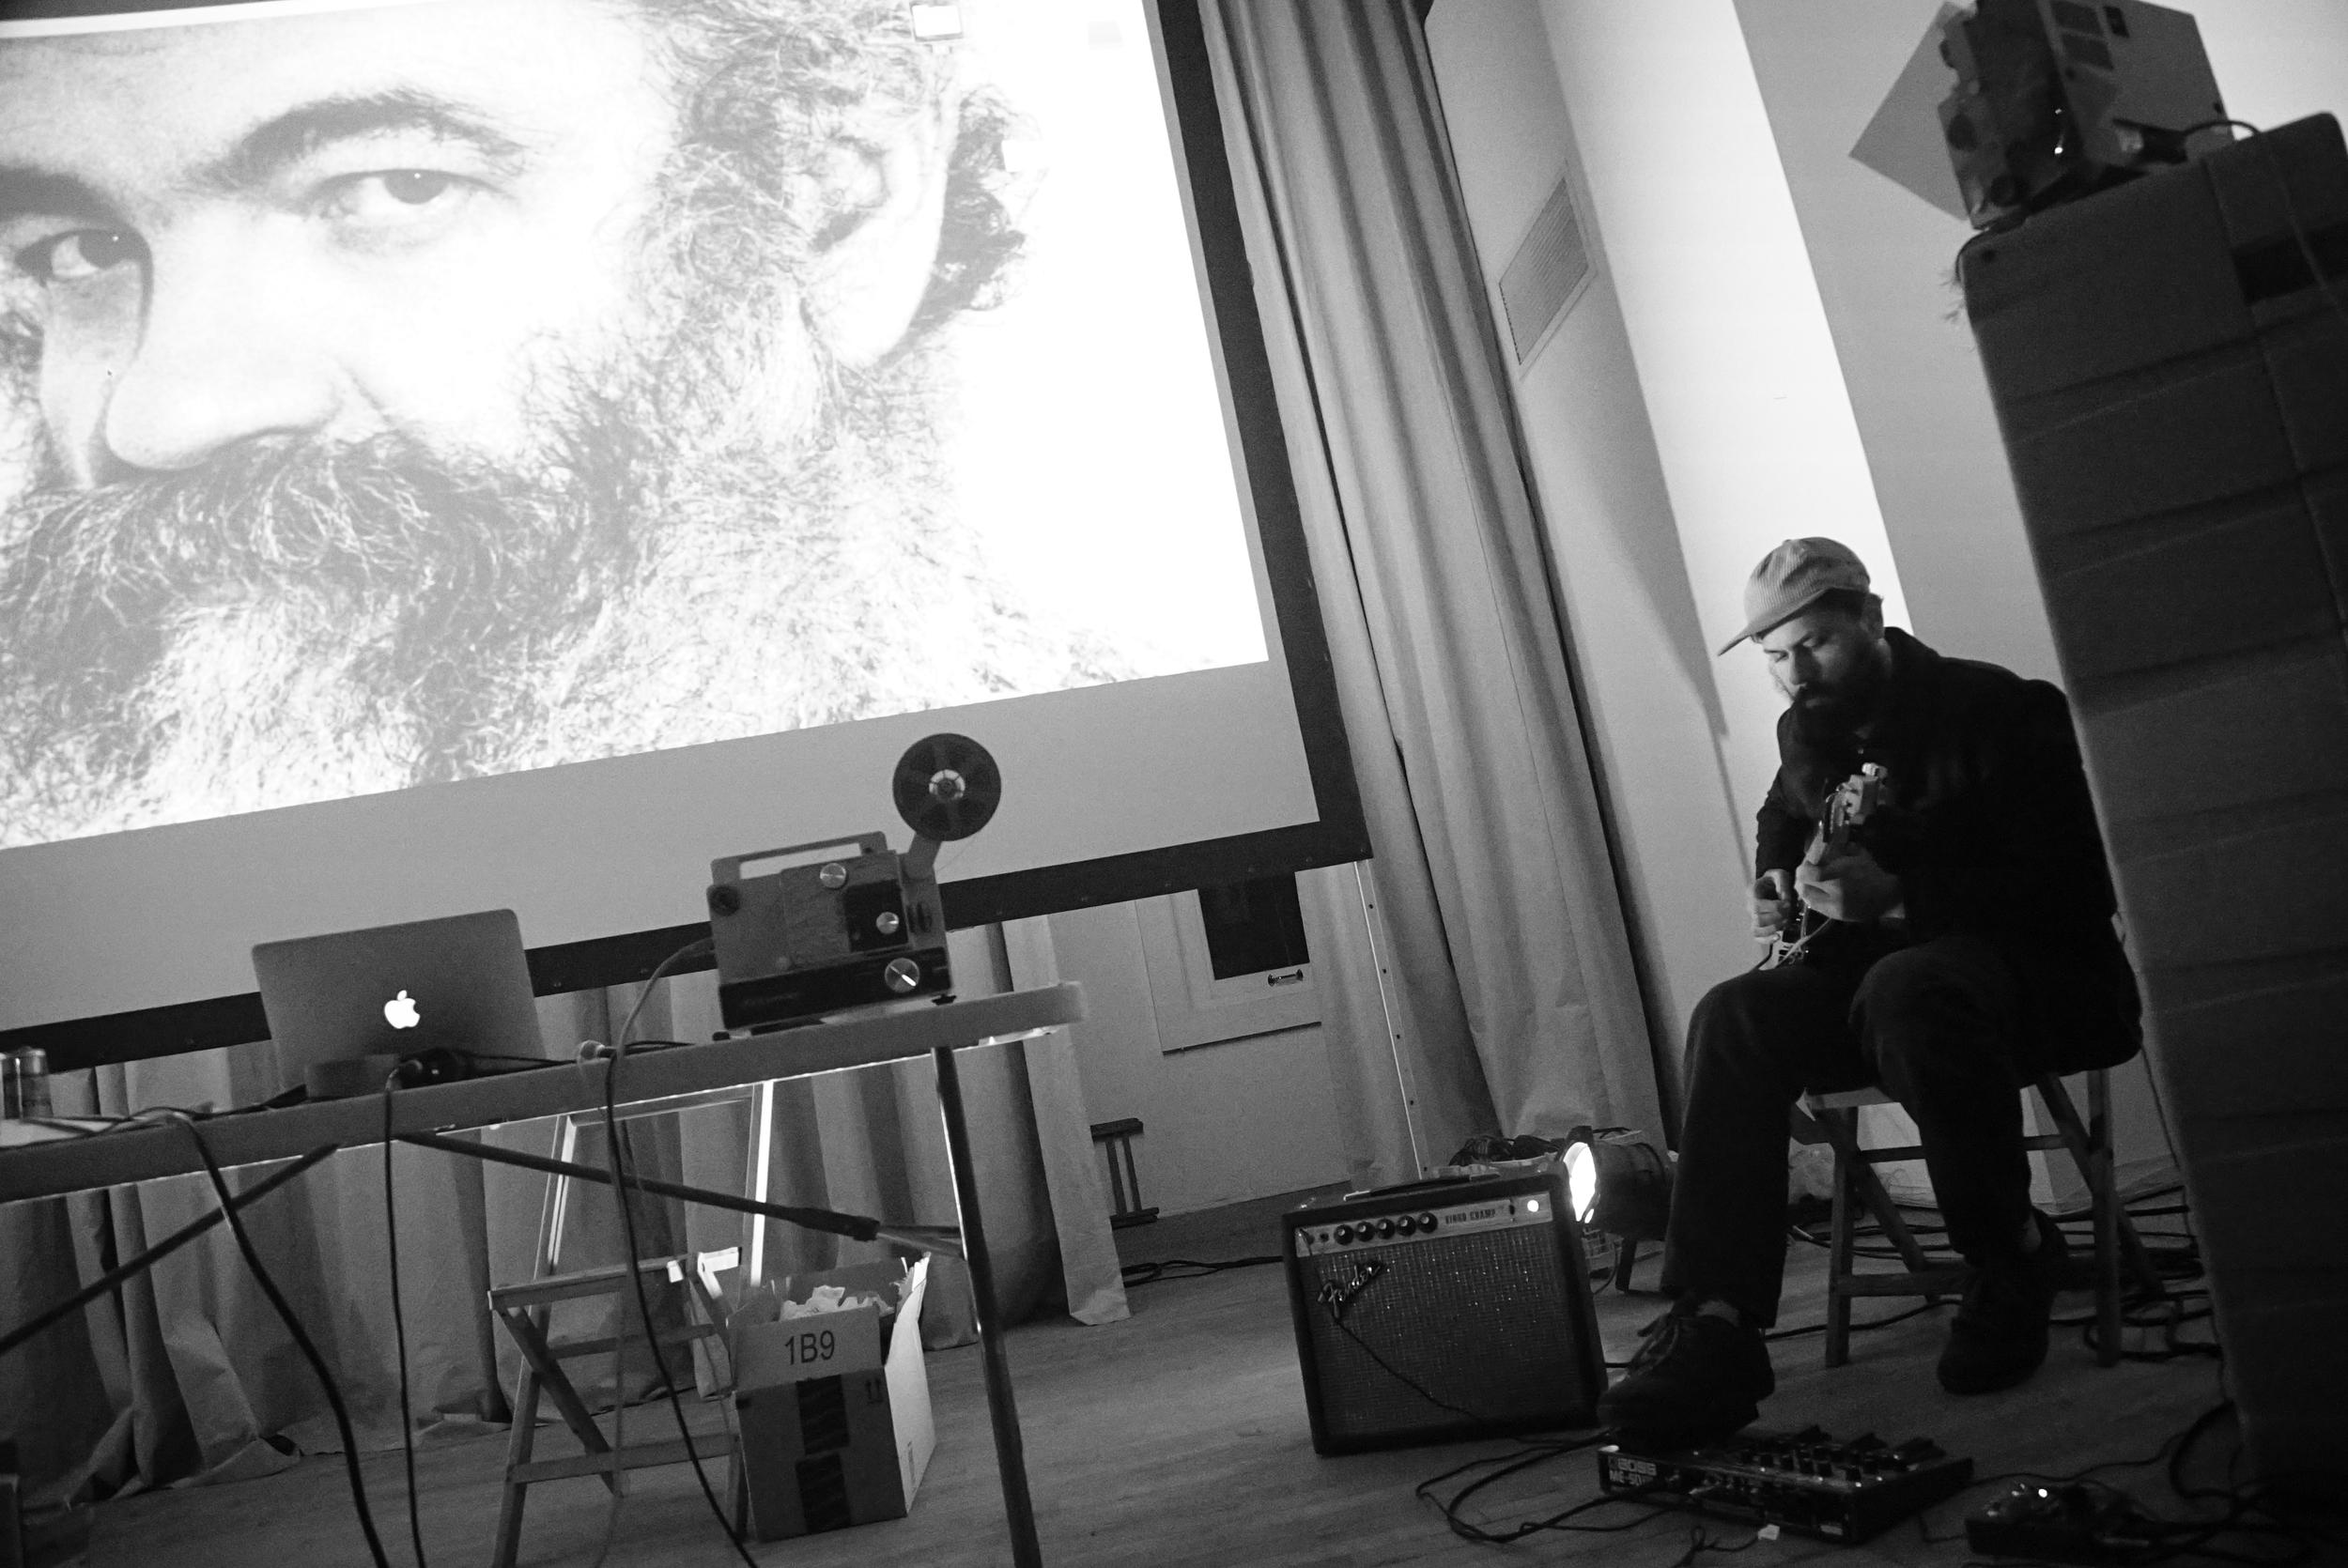 Performance photos by Bradley Buerhing